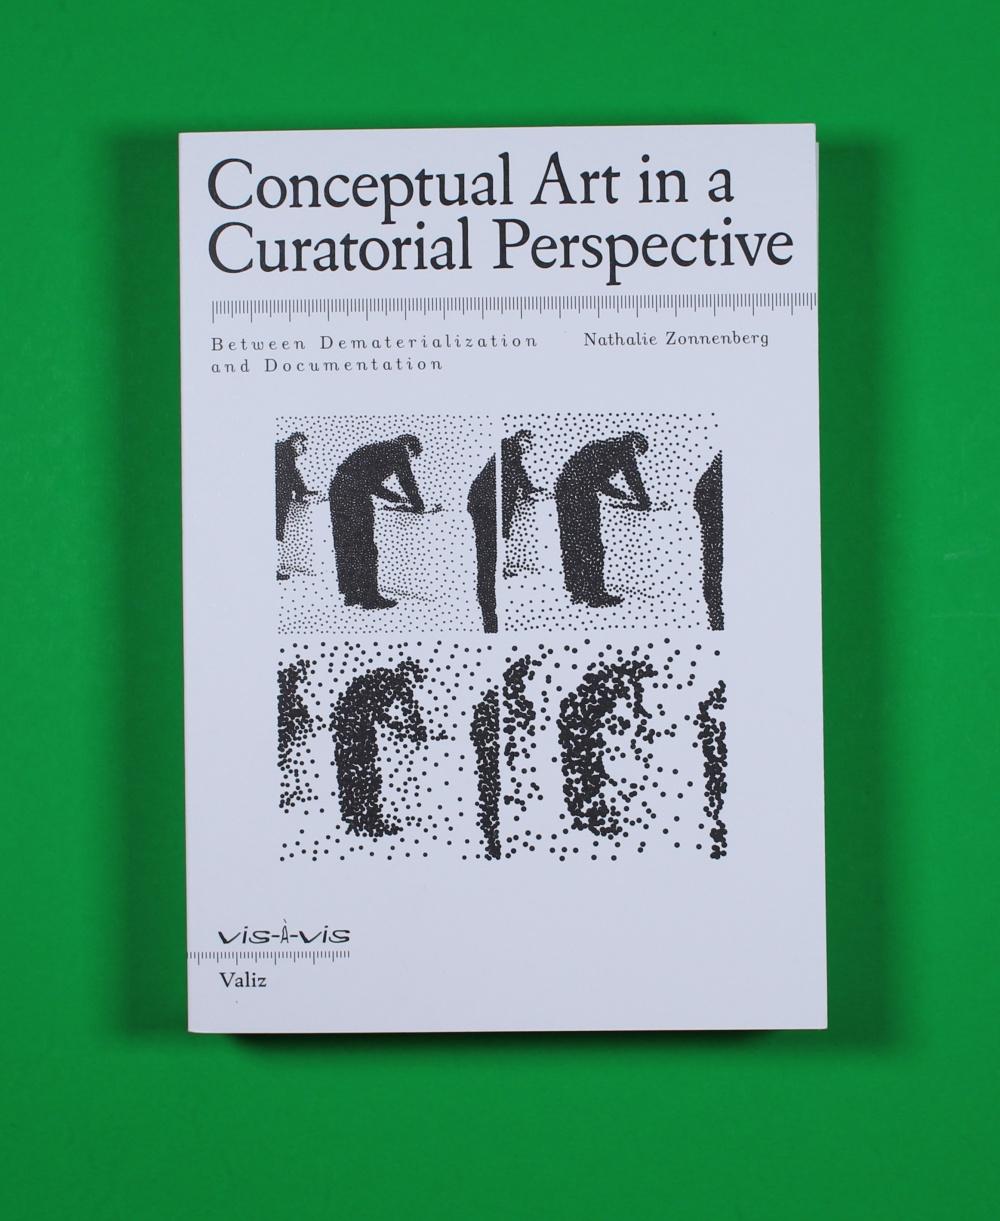 Conceptual Art in Curatorial Practice